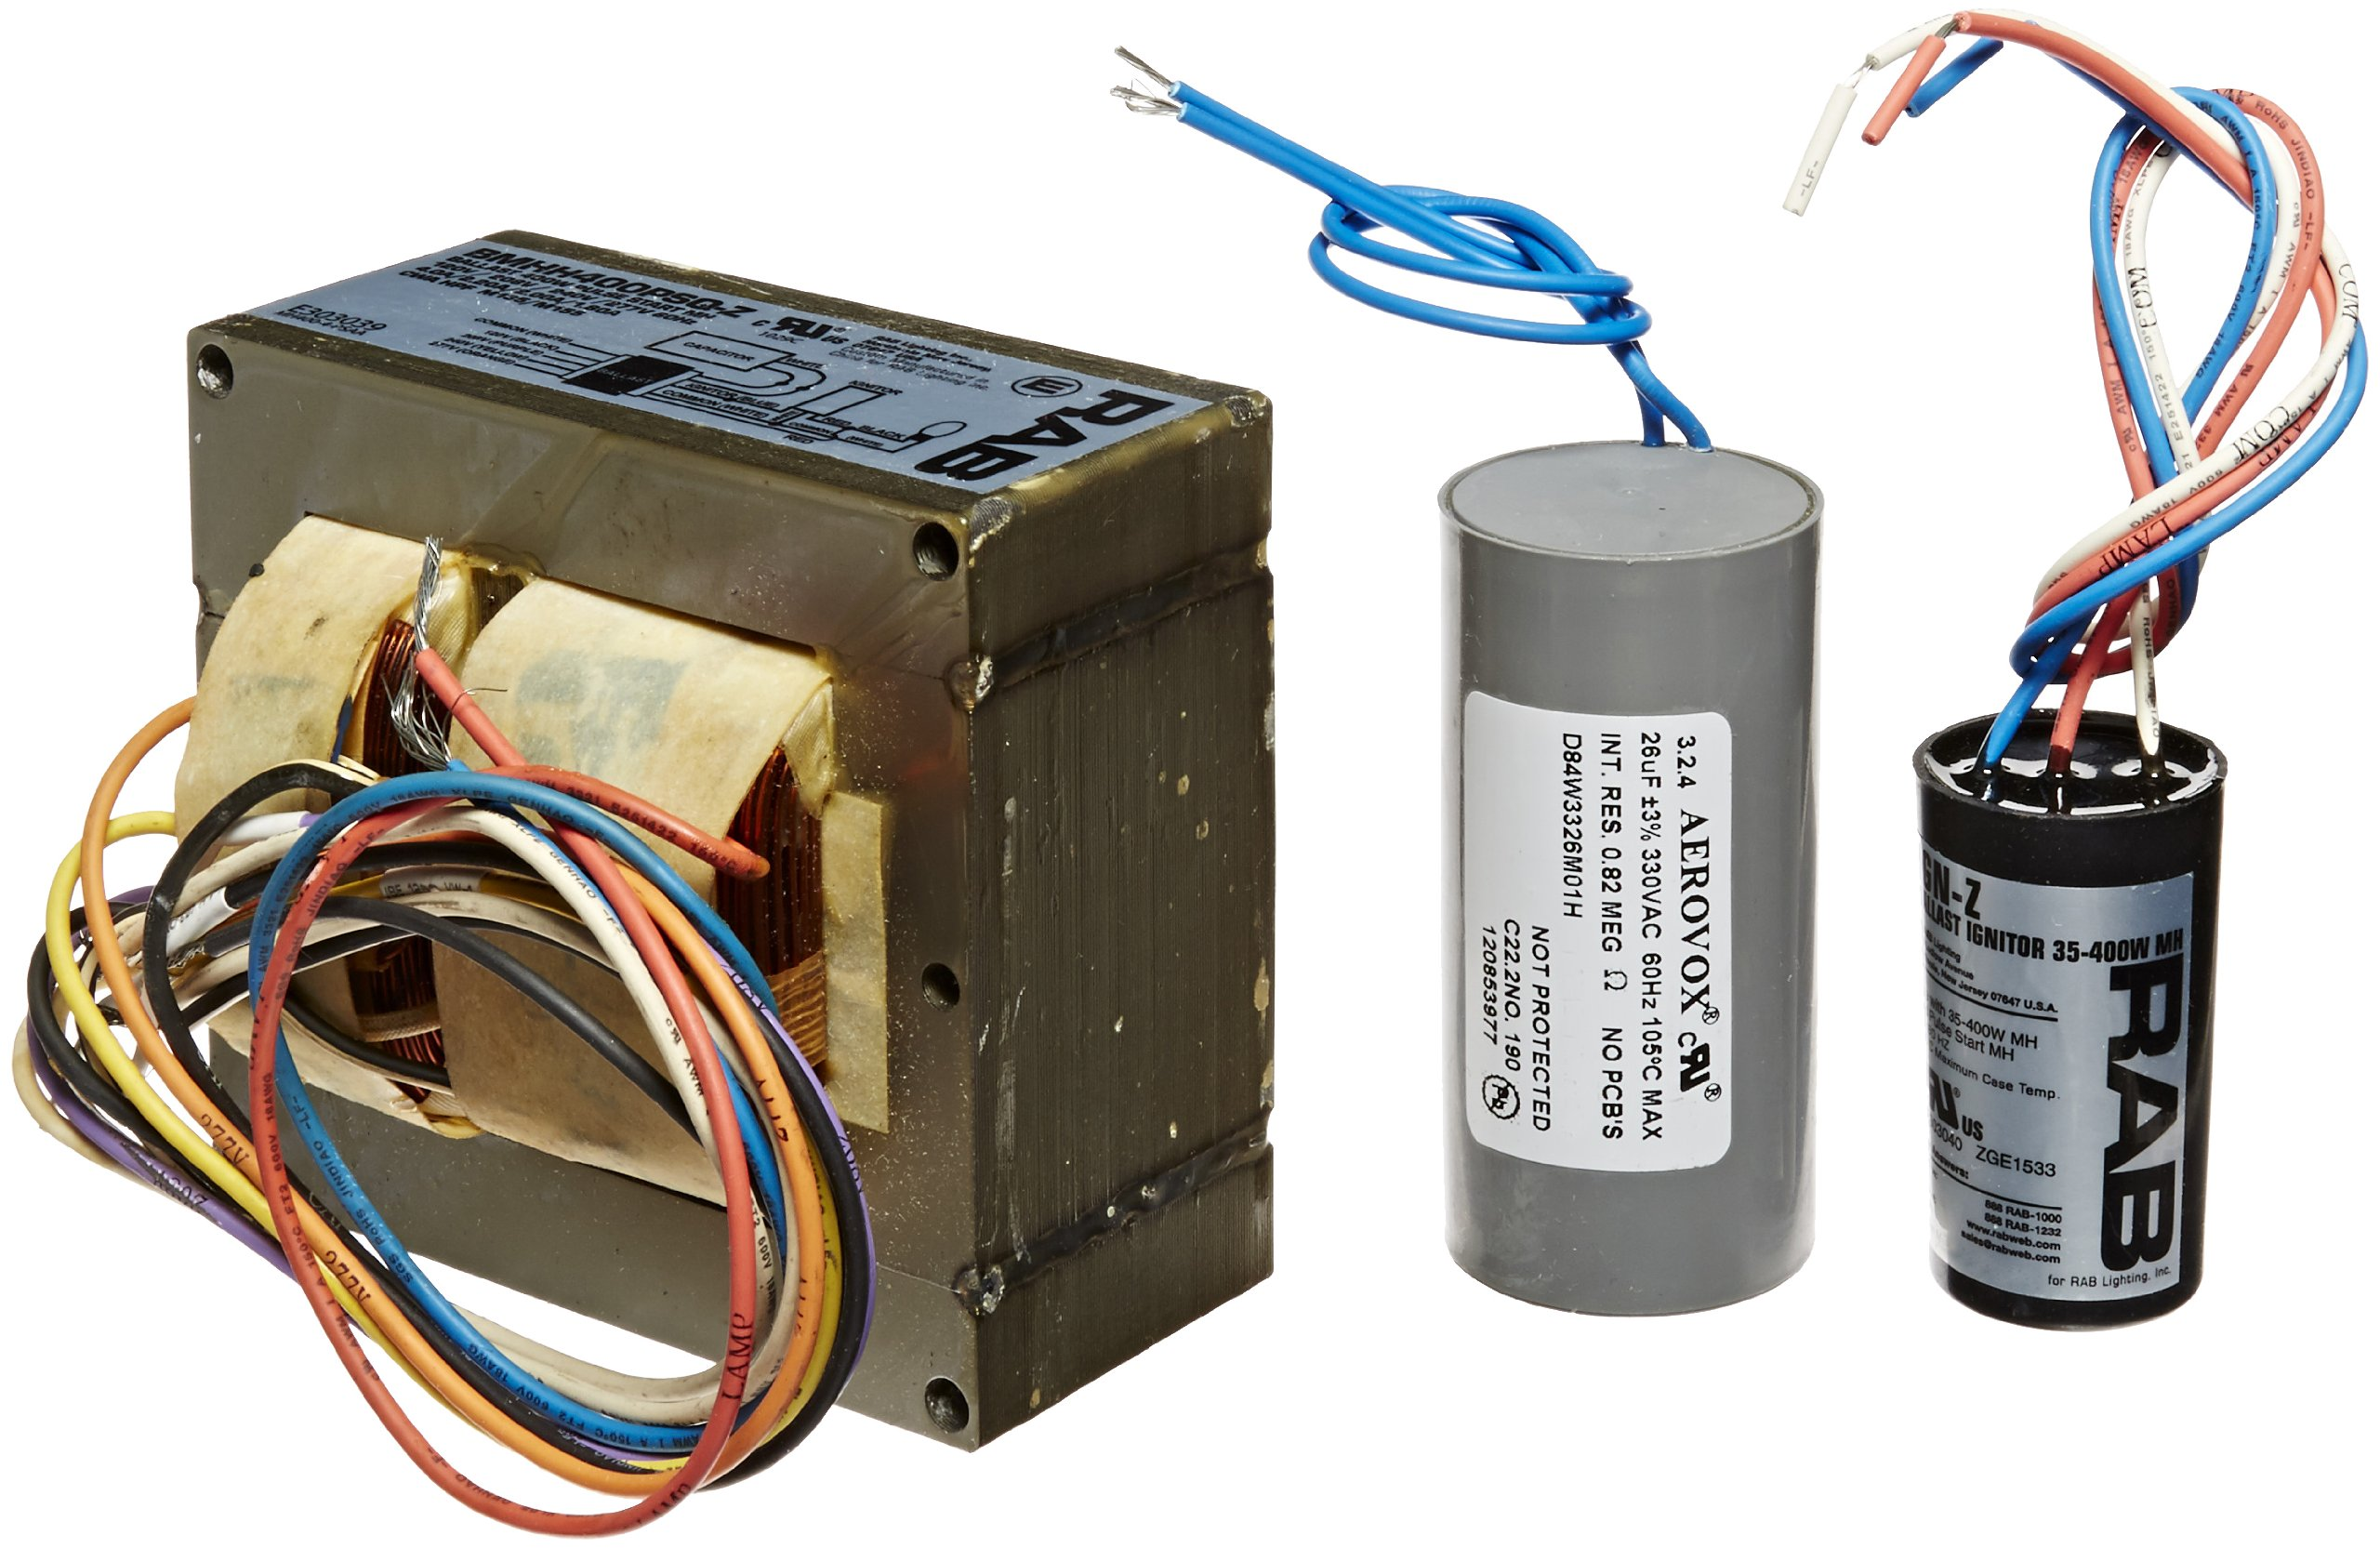 RAB Lighting BMHH400PSQ Metal Halide and Pulse Start Ballast Kit, 400W Power